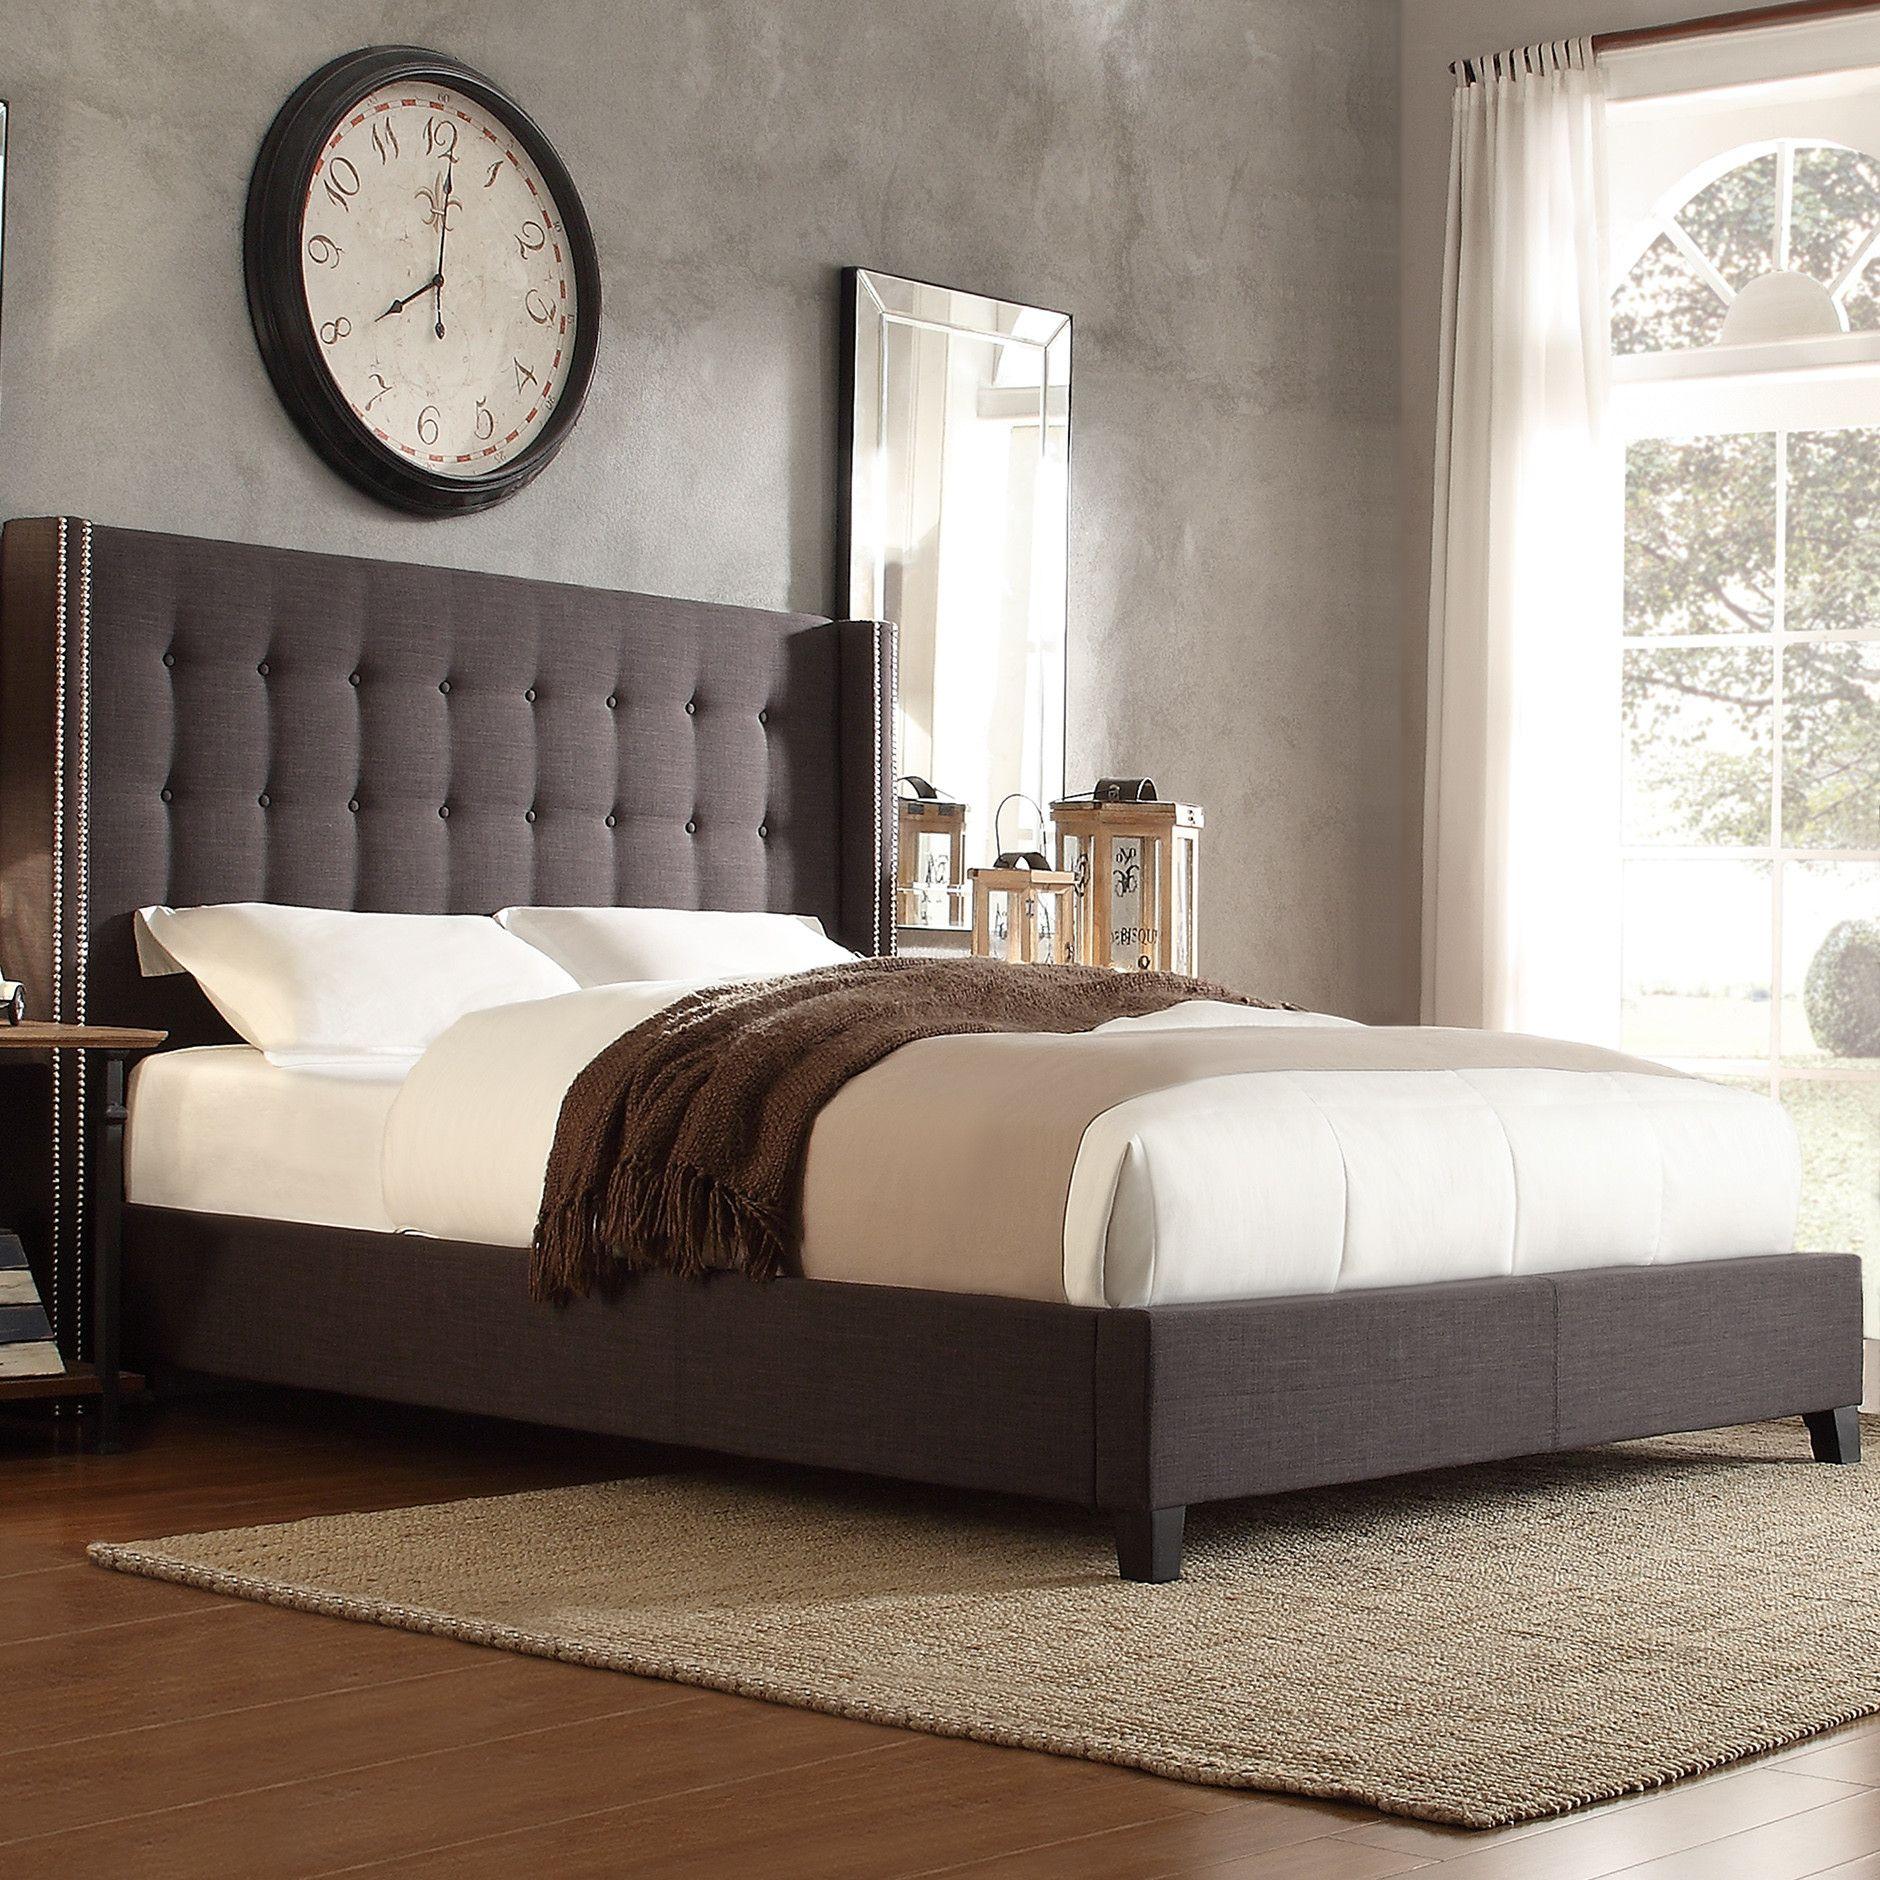 Kingstown Home Mackenna Linen Upholstered Wingback Bed